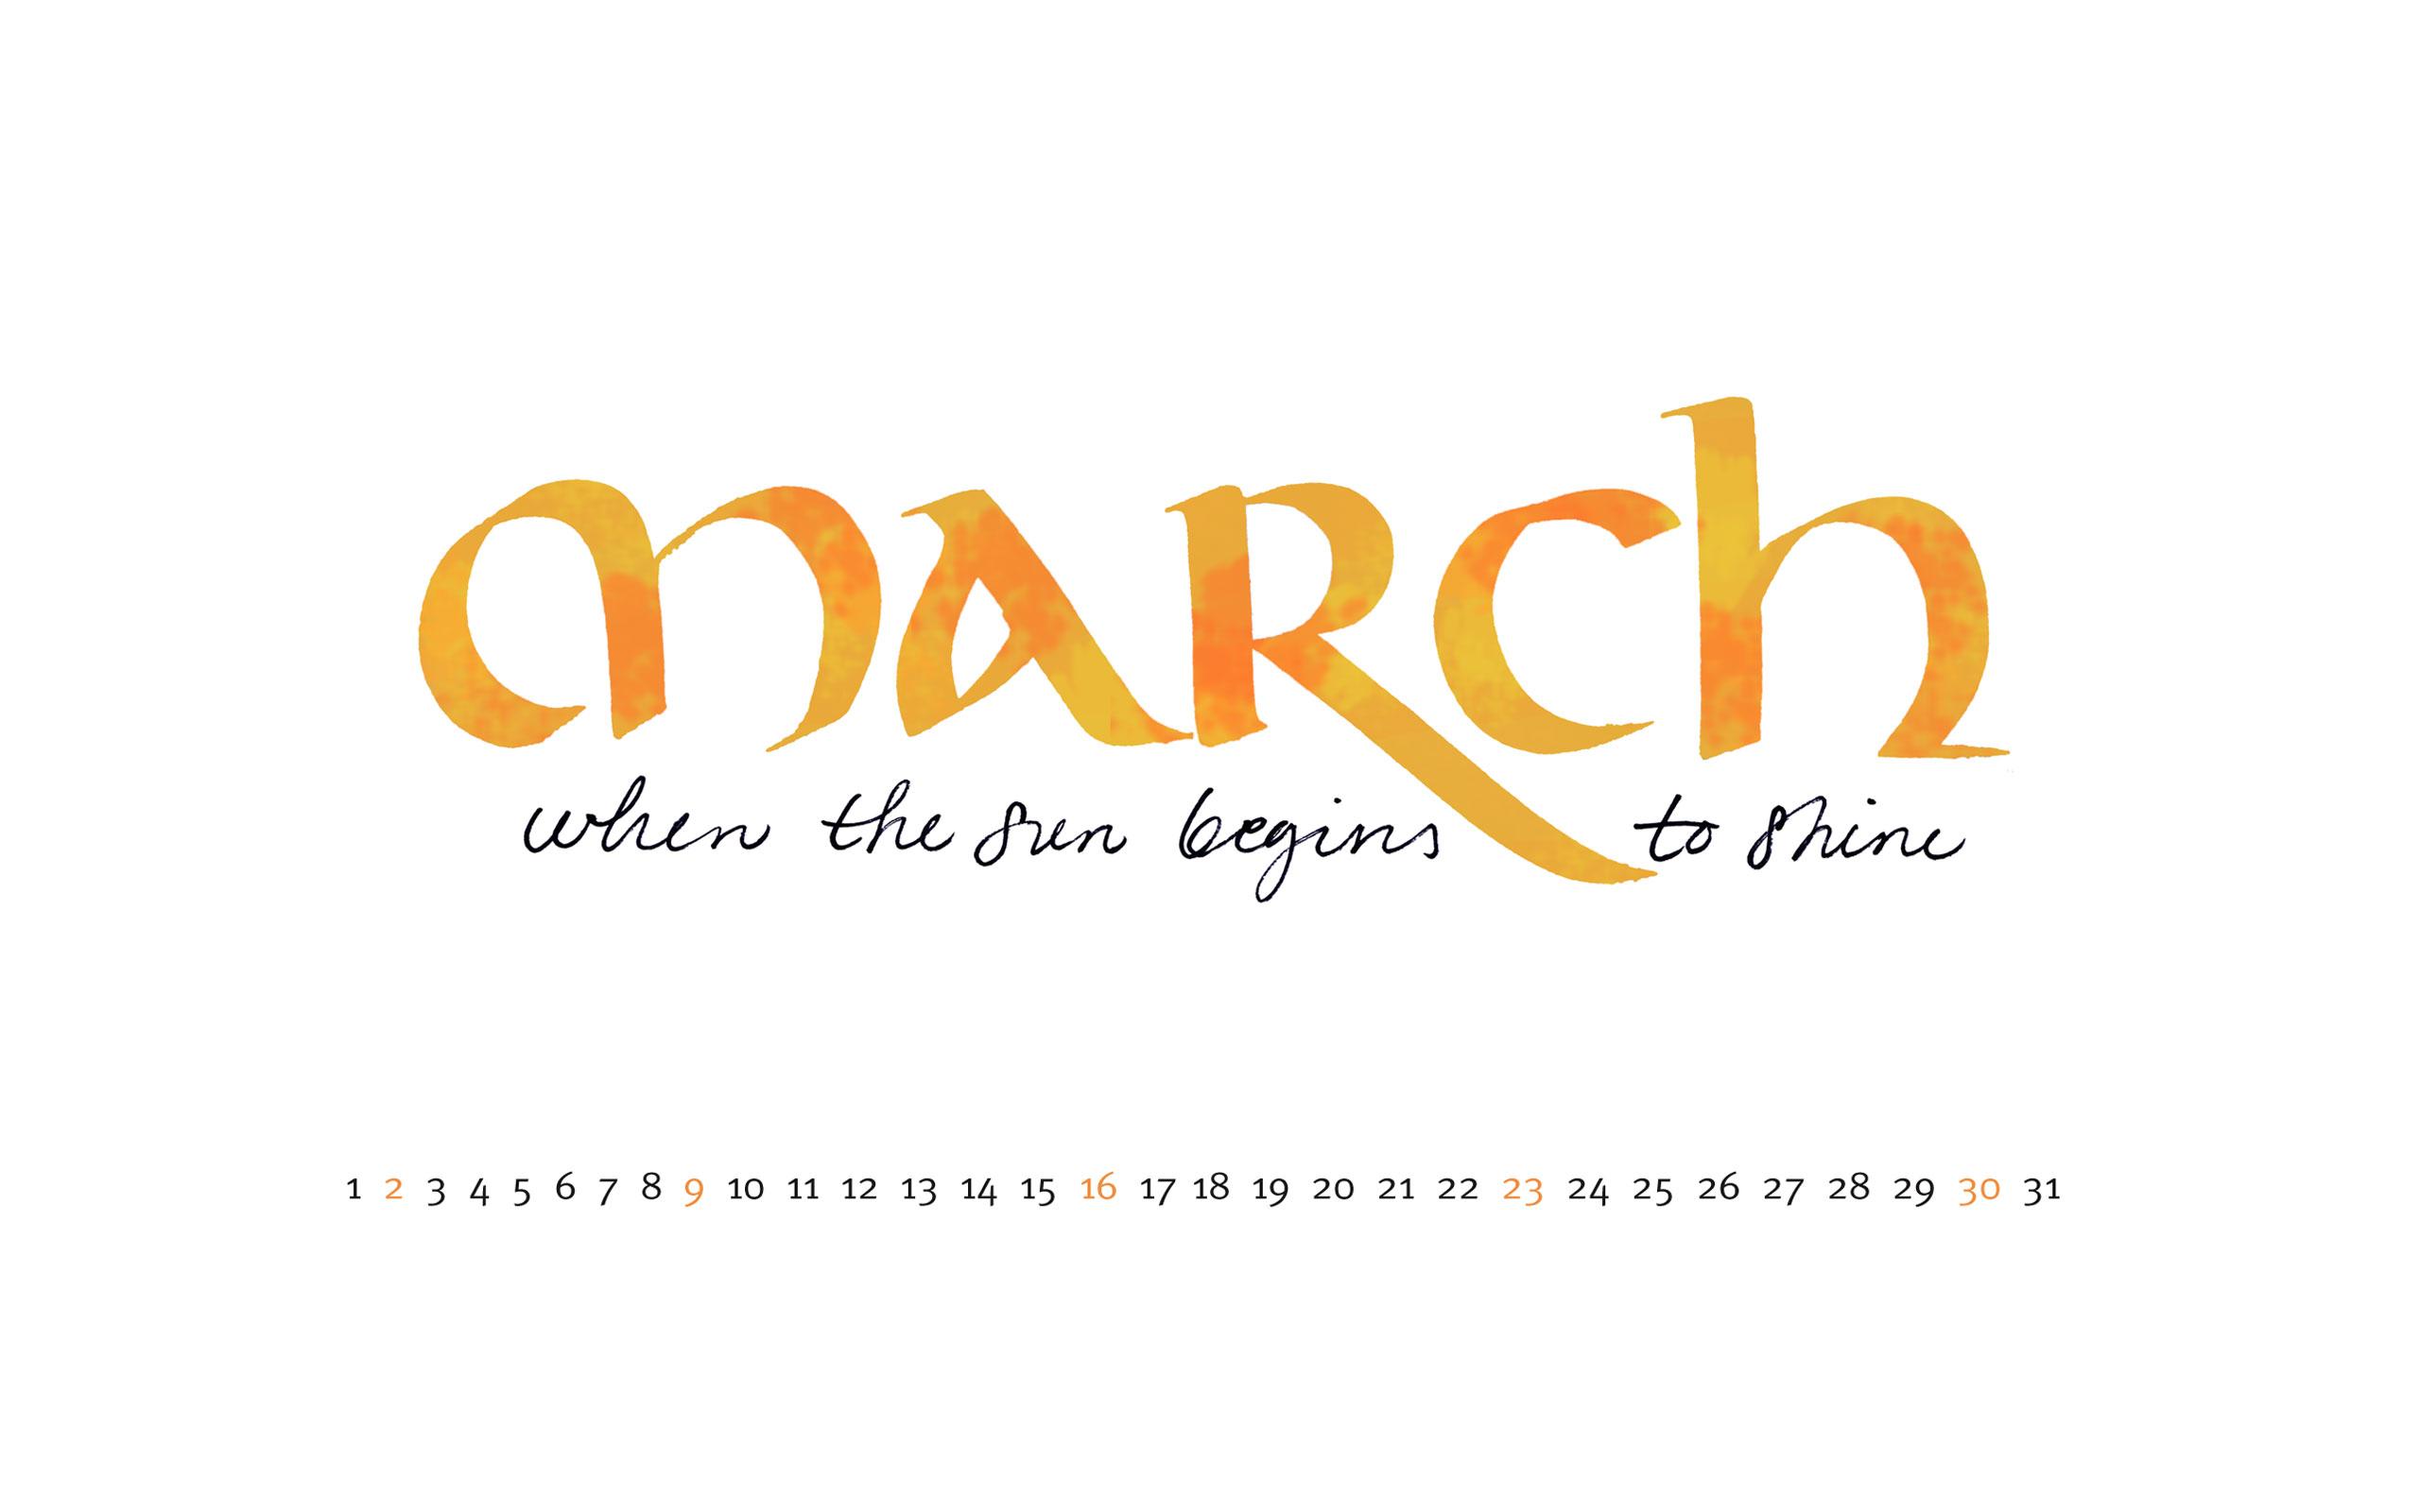 50+] Calligraphy Wallpaper for Desktop on WallpaperSafari